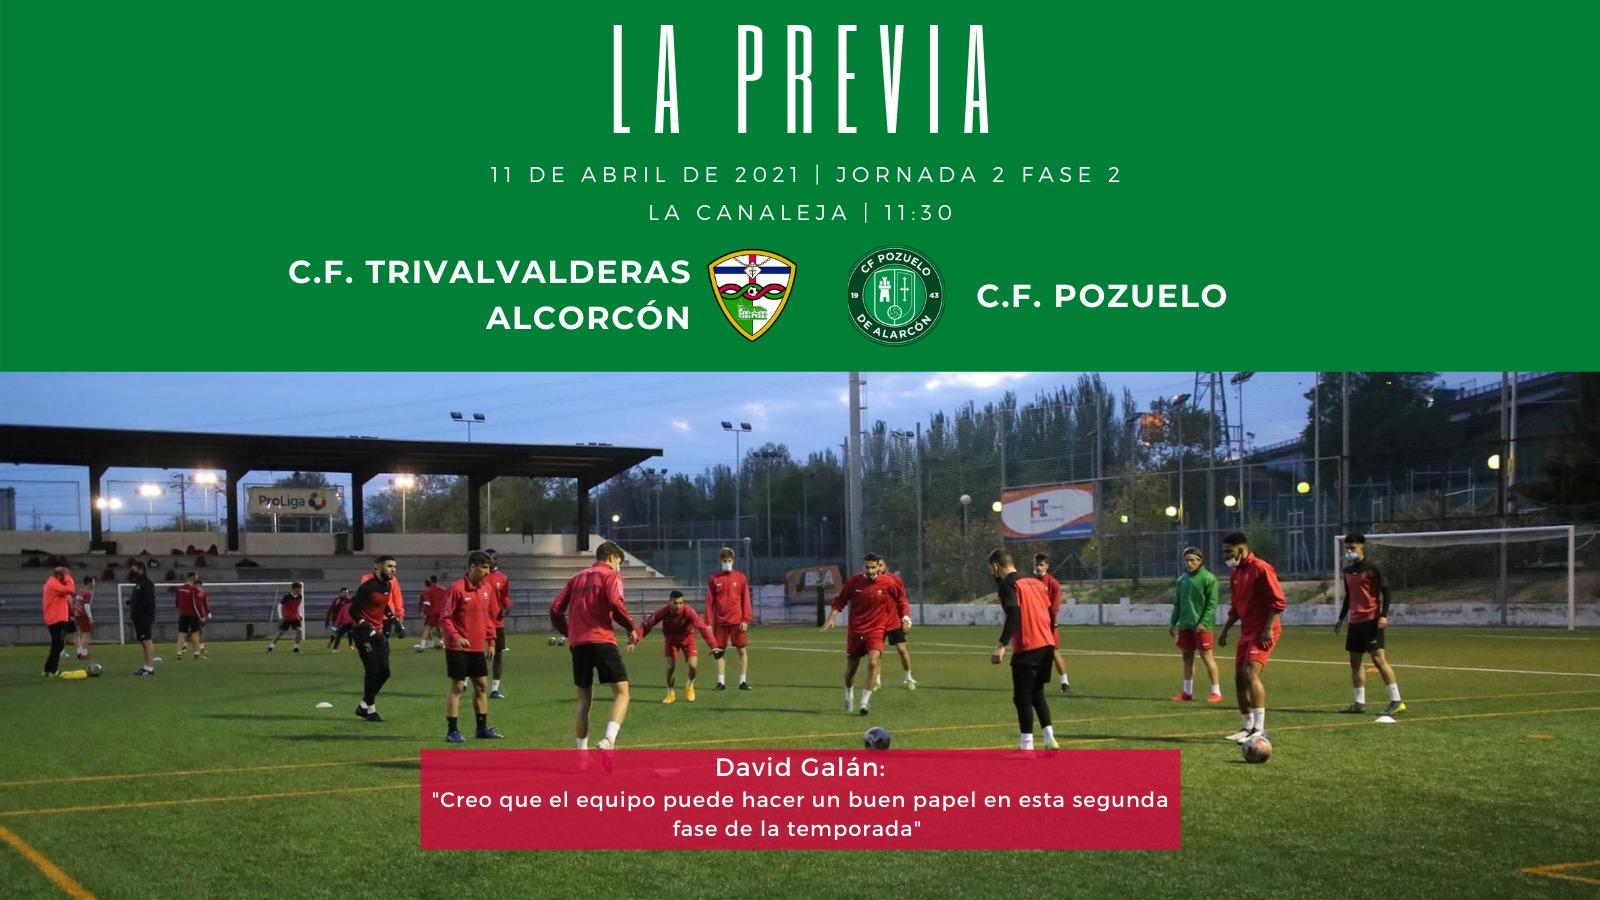 PREVIA J2 FASE 2|C.F. TrivalValderas Alcorcón - C.F. Pozuelo